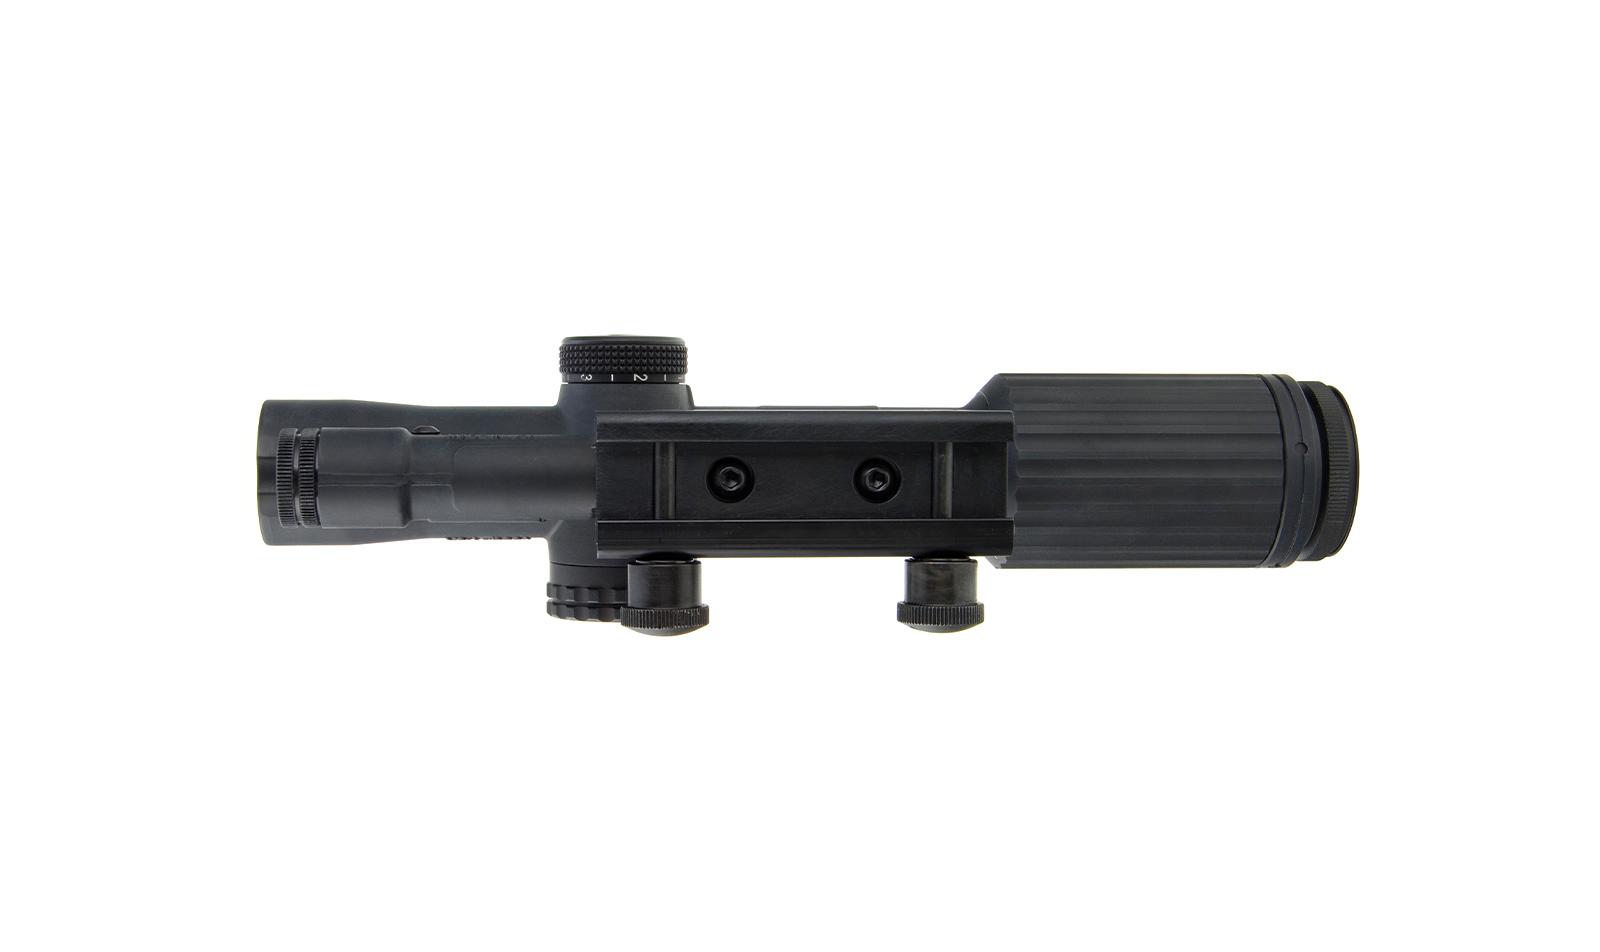 VC16-C-1600046 angle 10